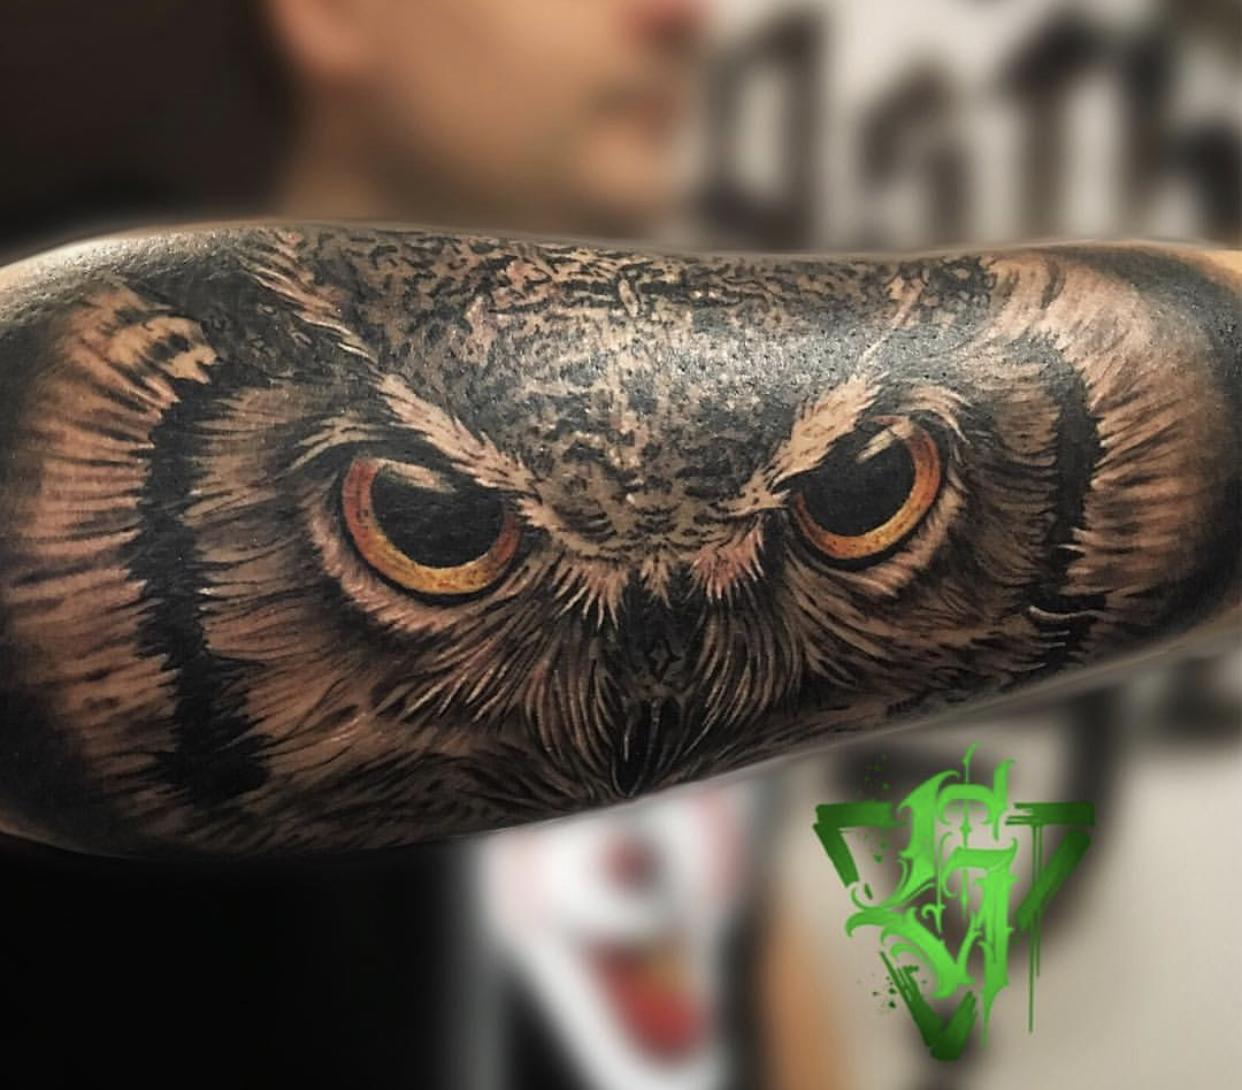 Aitor Vega Astro Vega Ghetto Youth Tattoo